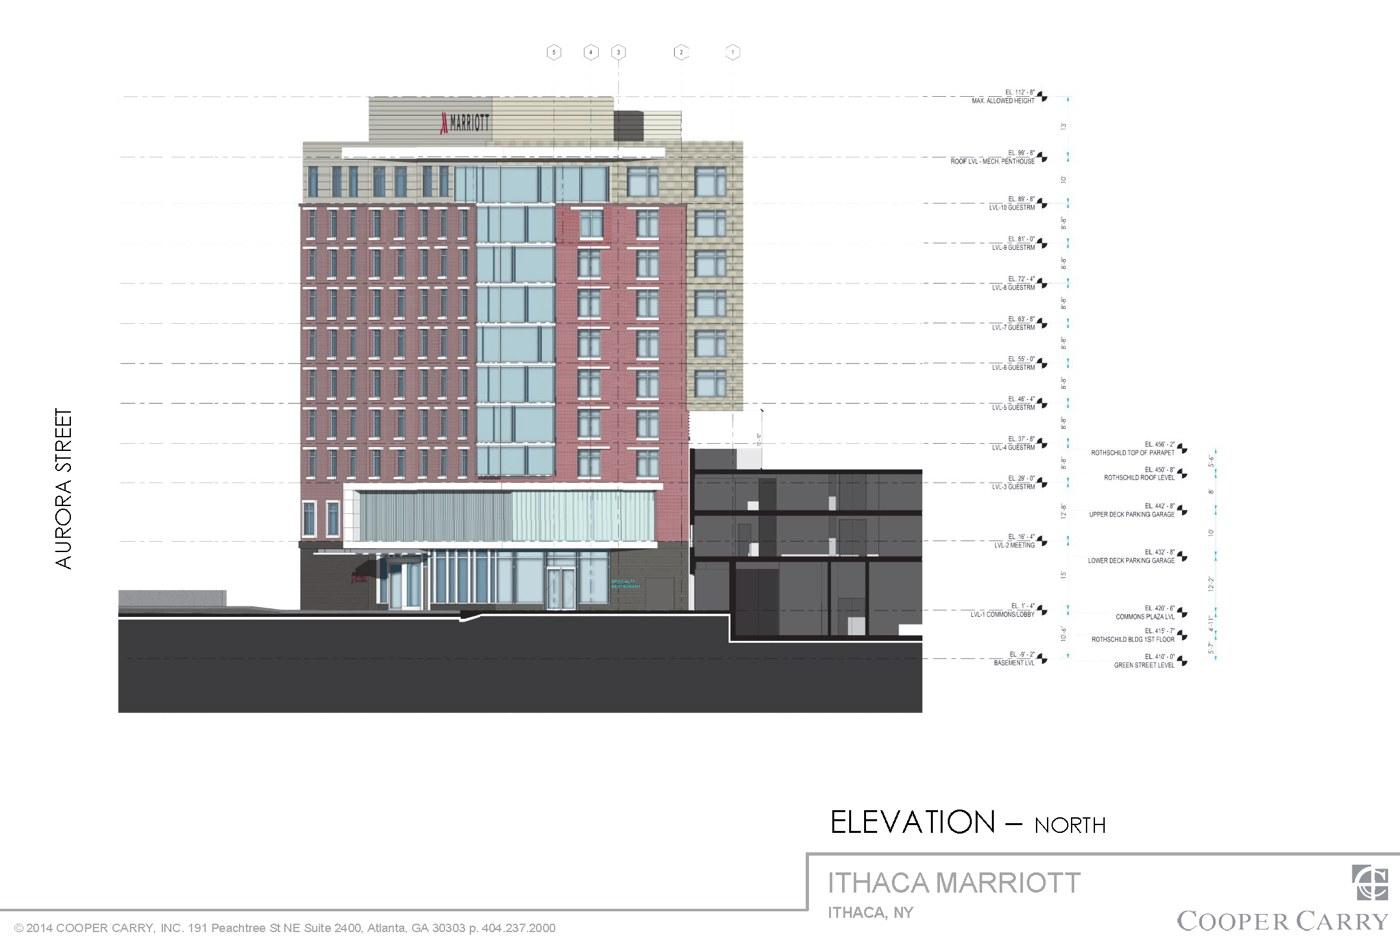 Marriott Hotel - Planning Board Presentation - 06-10-14_Page_3